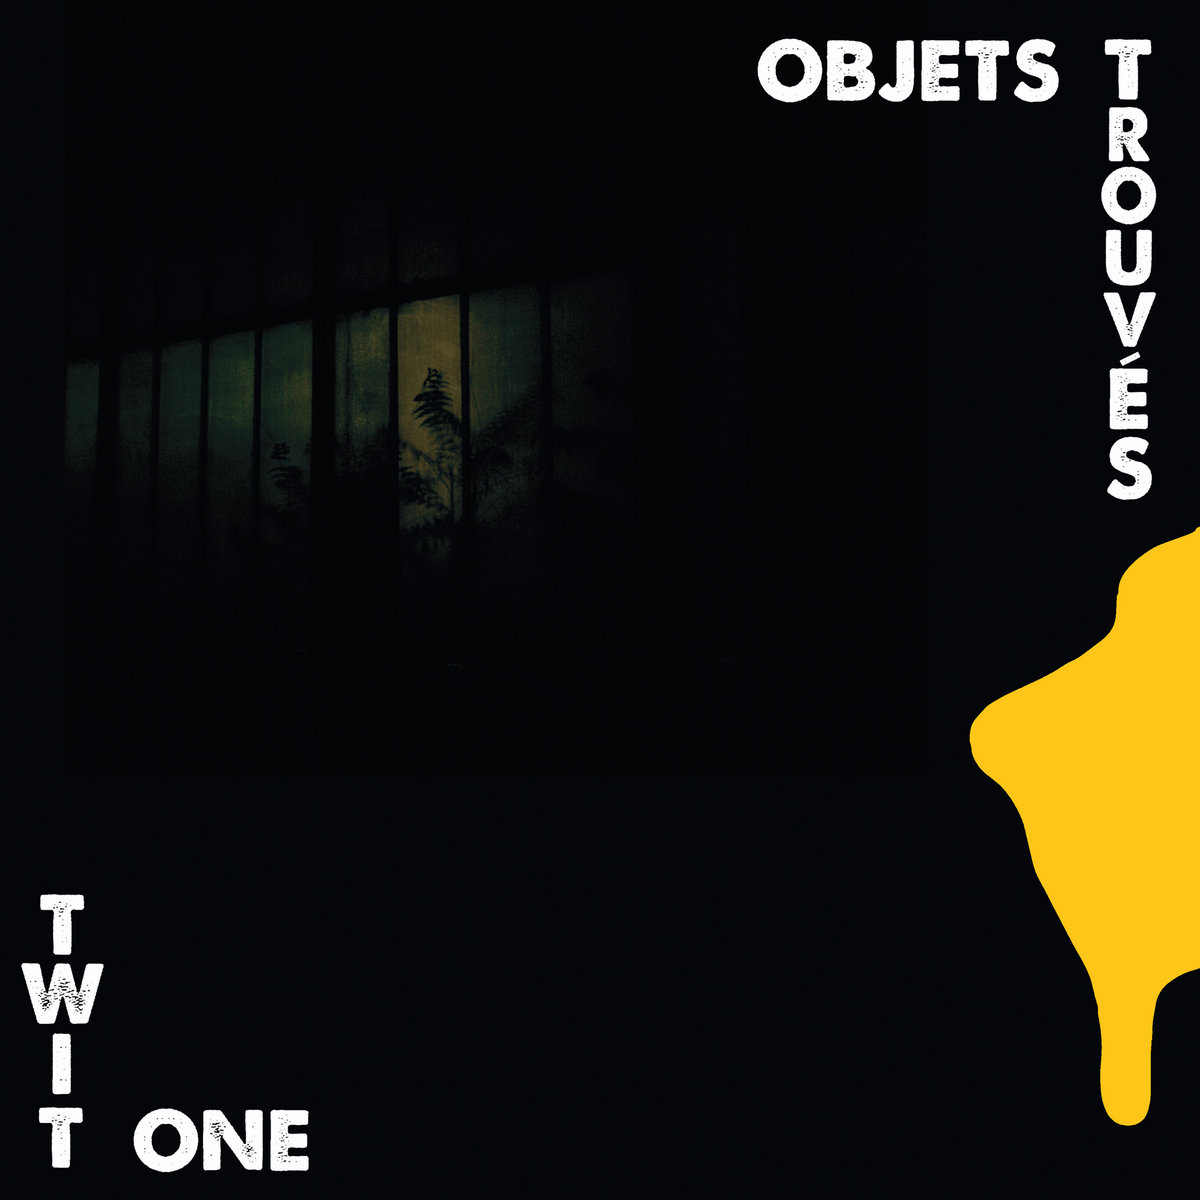 Twit One| Objets Trouvés